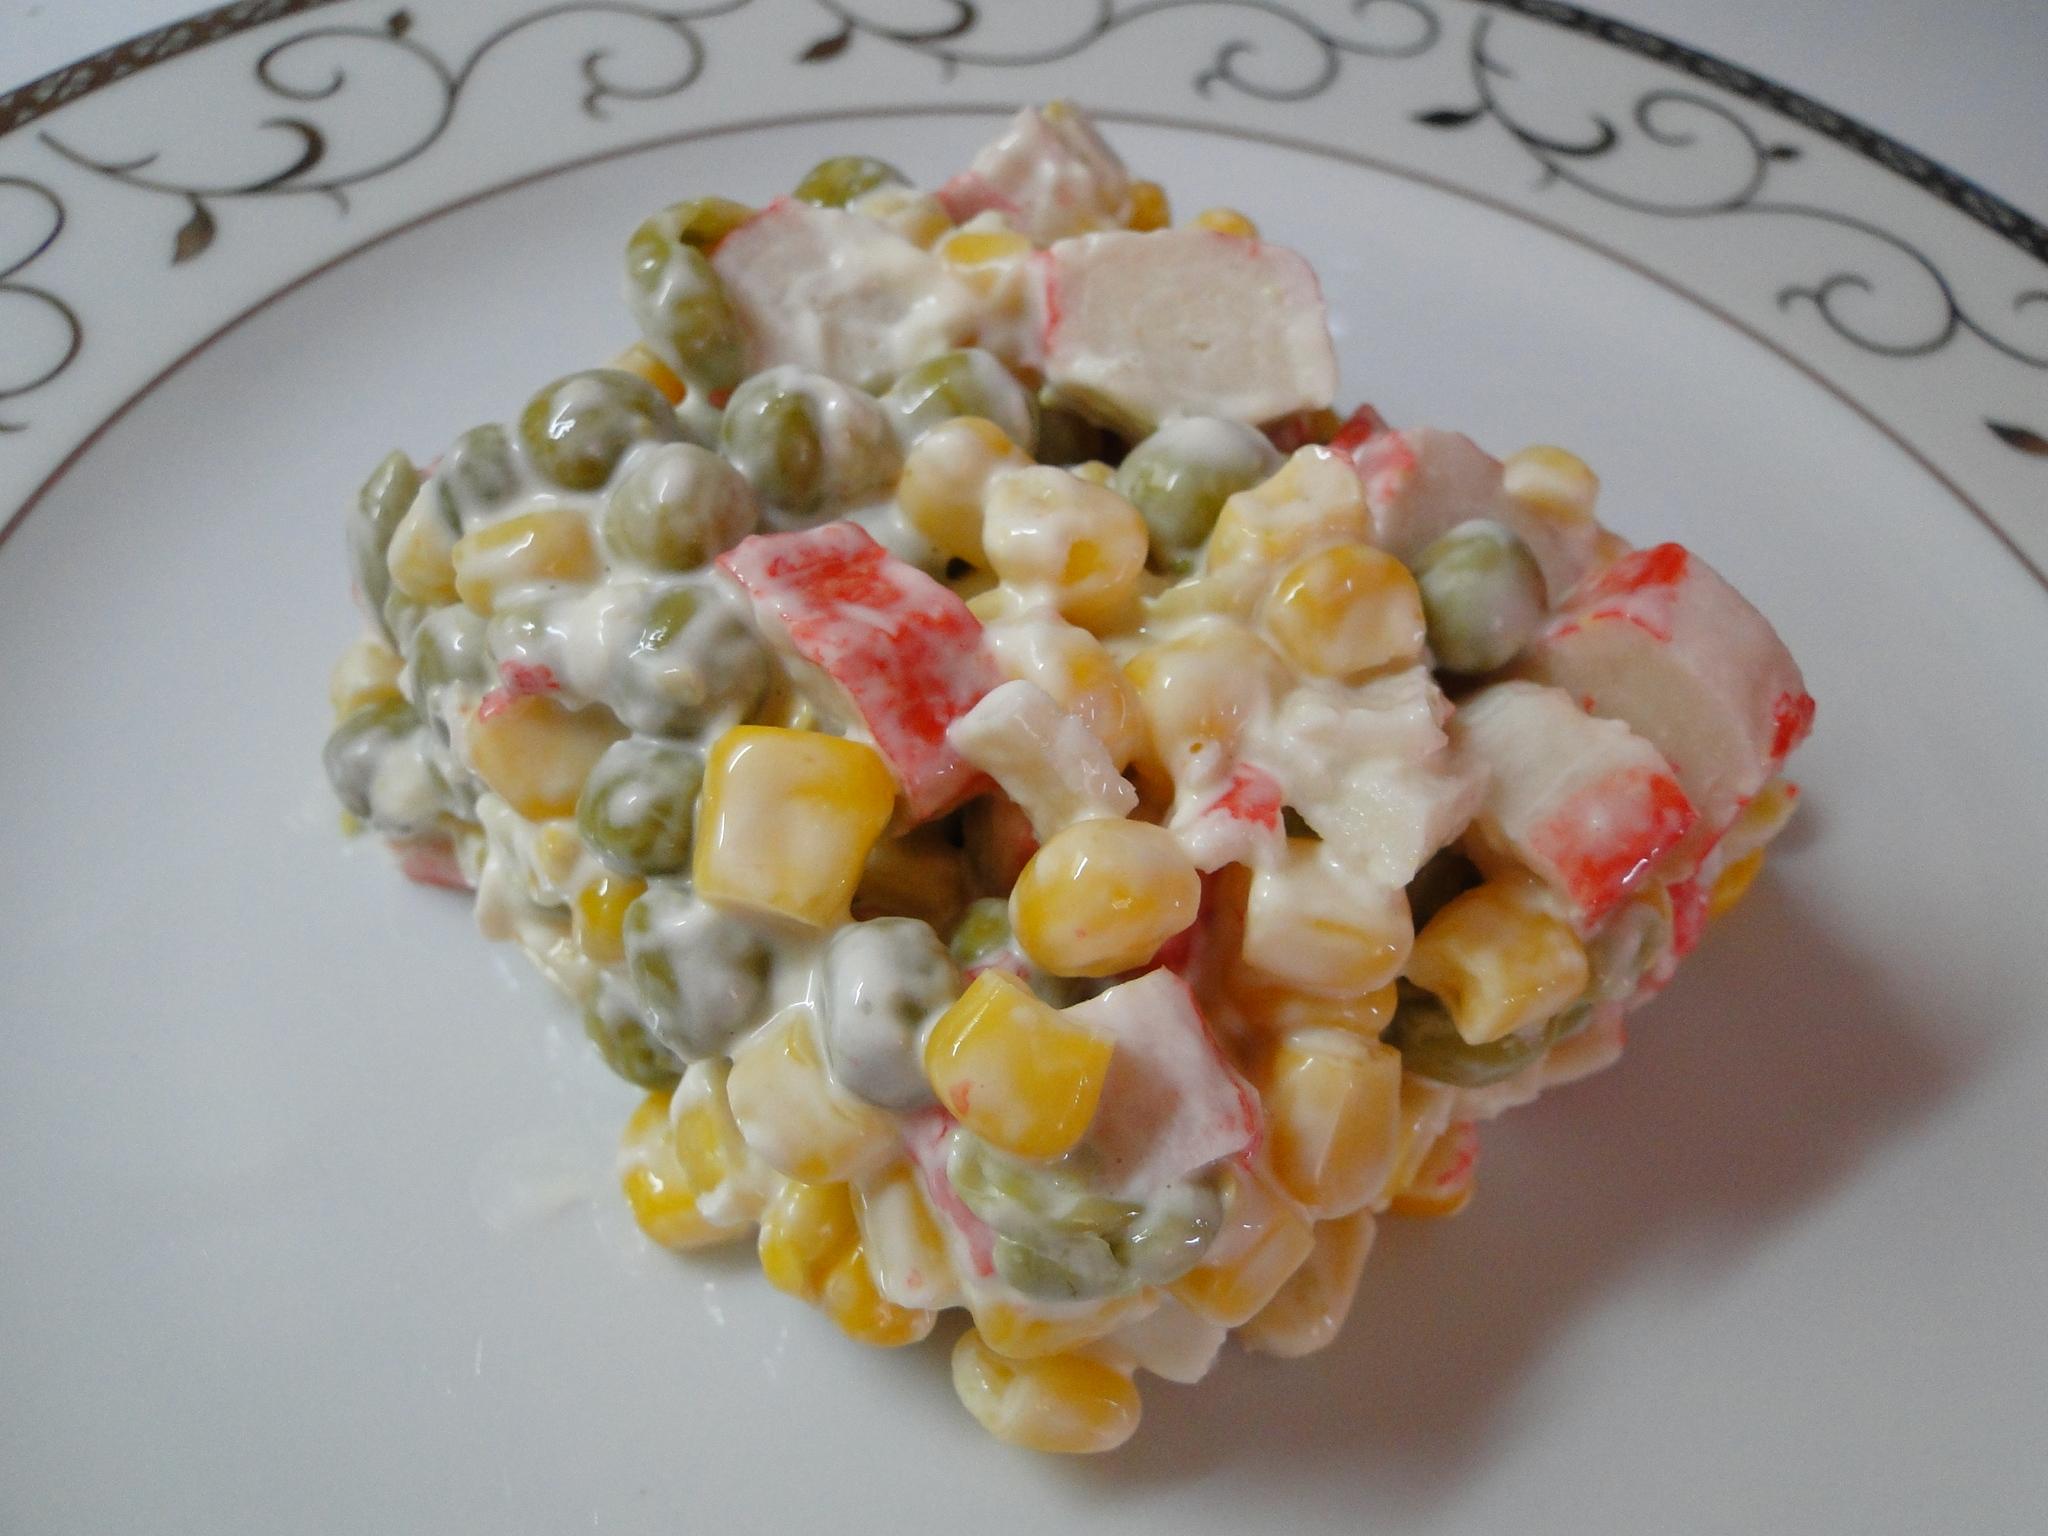 salata_s_rulza_ot_razi